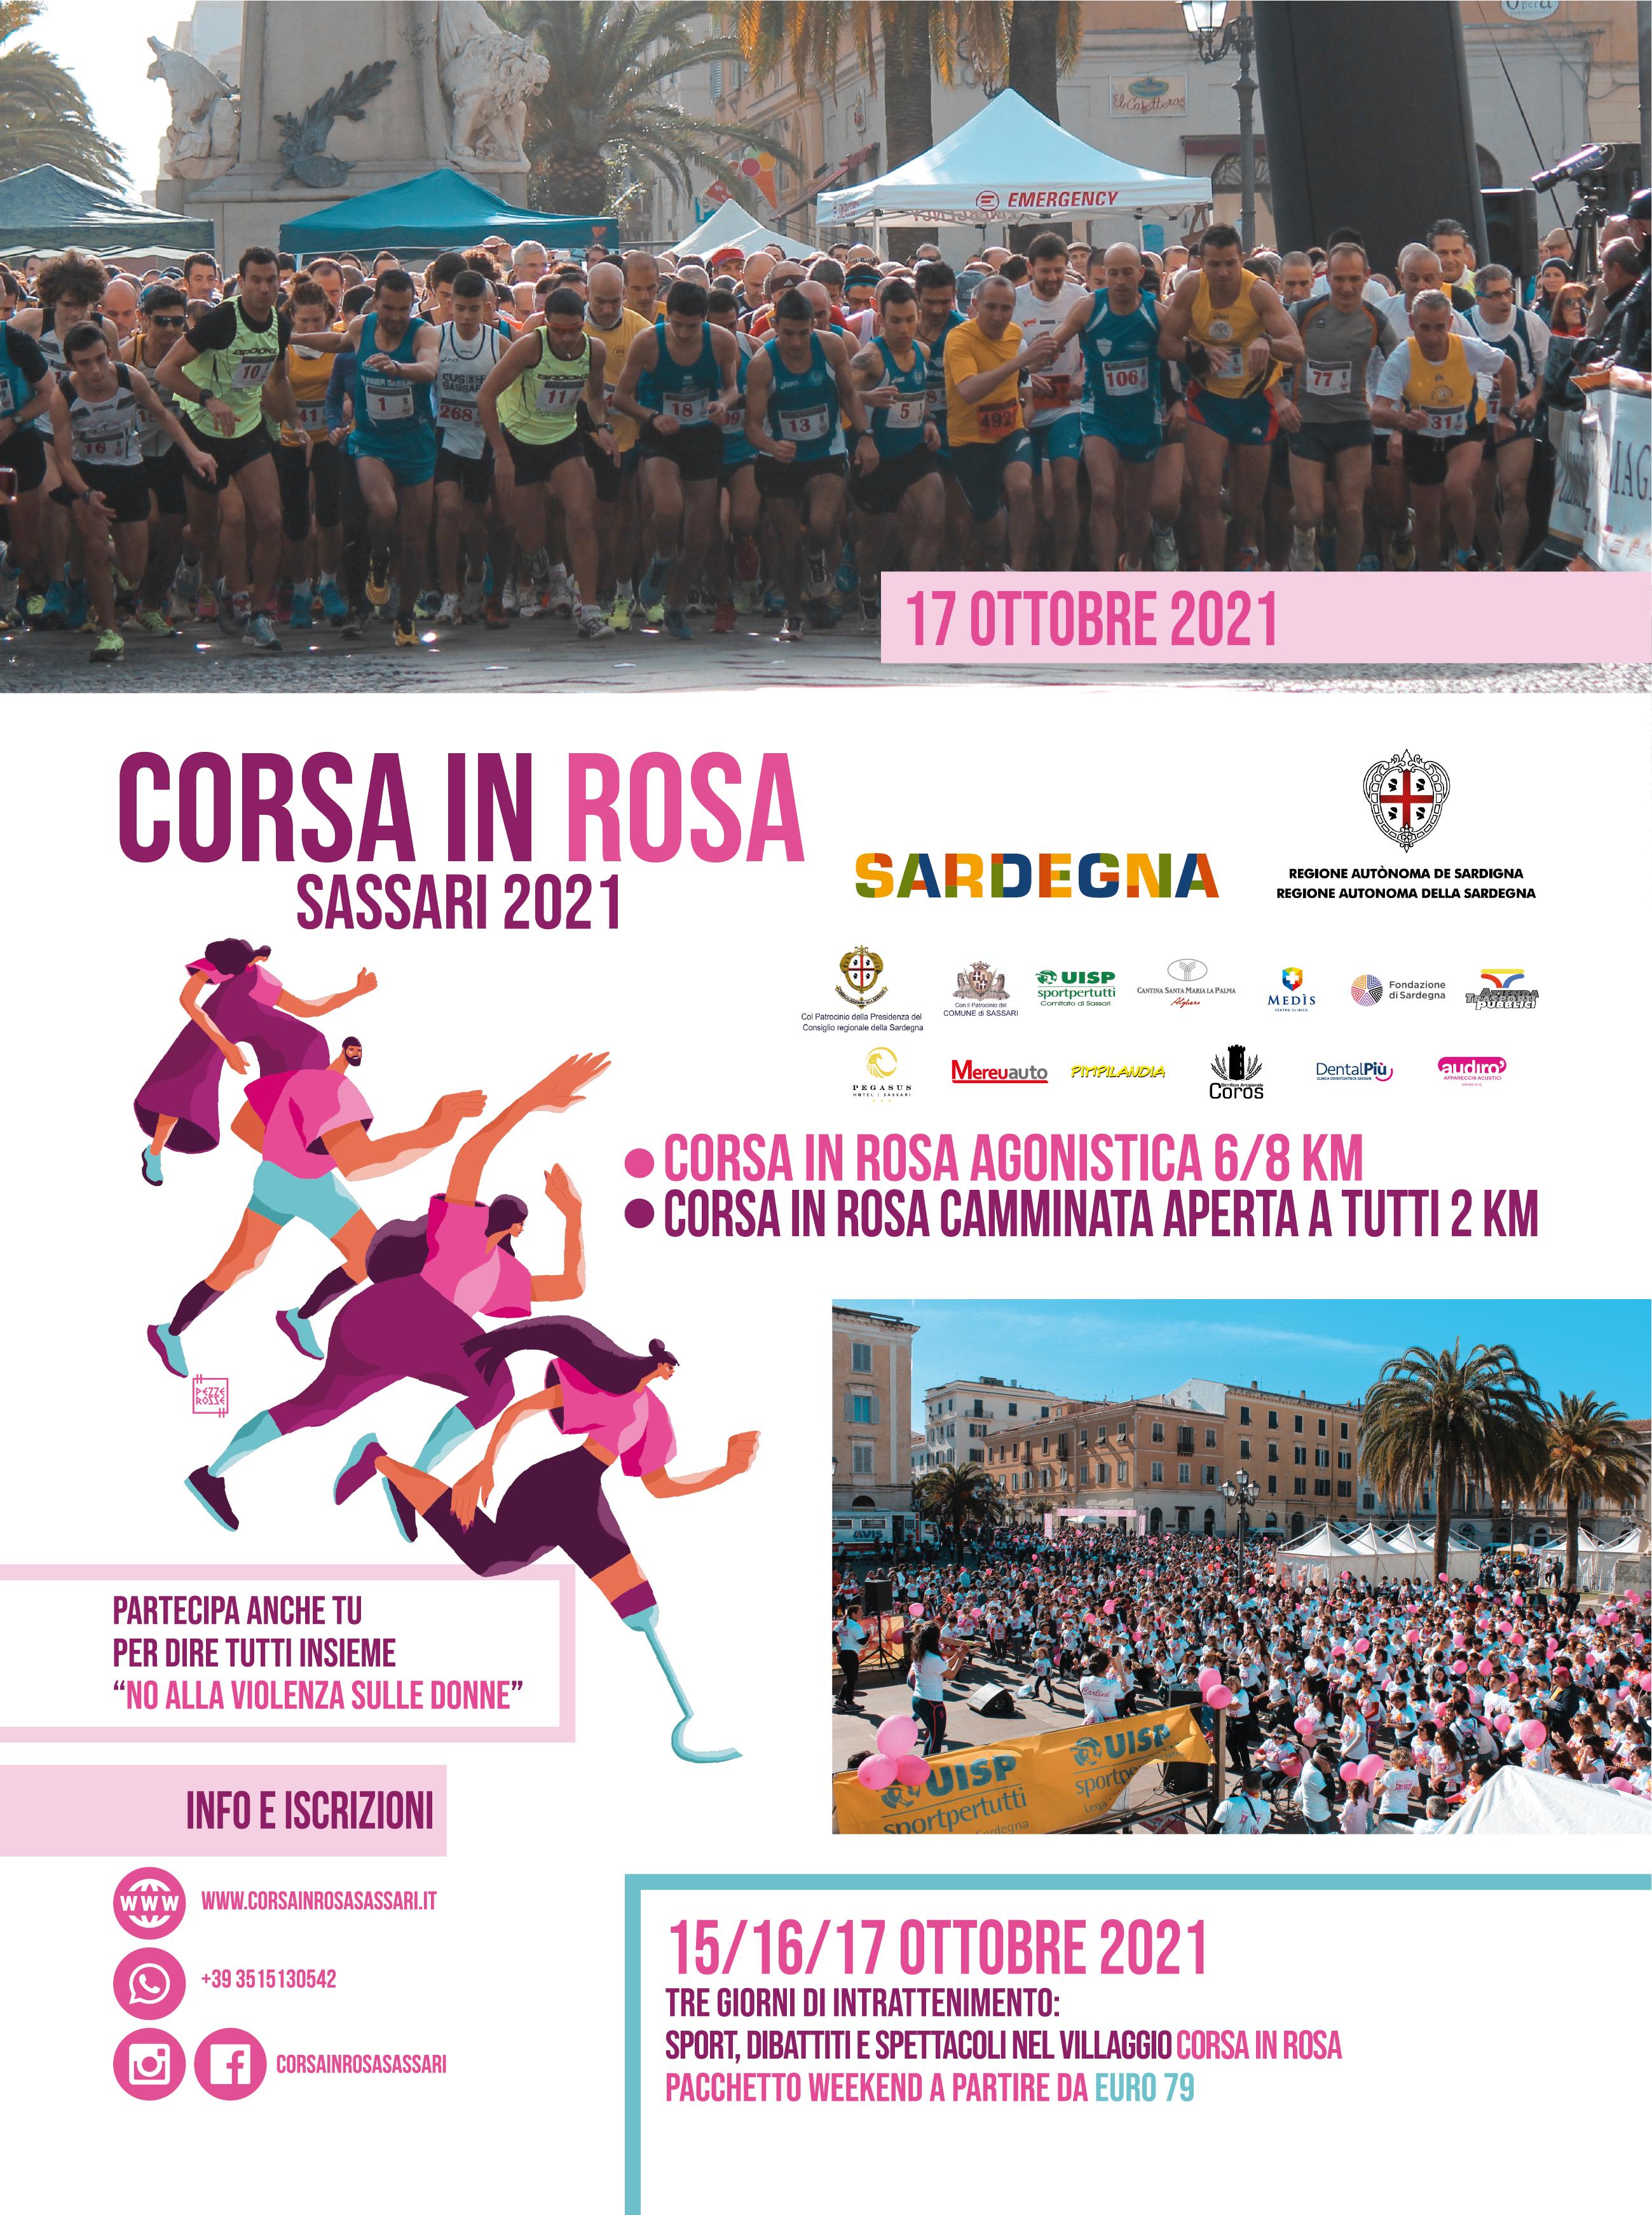 Corsa in Rosa, Sassari